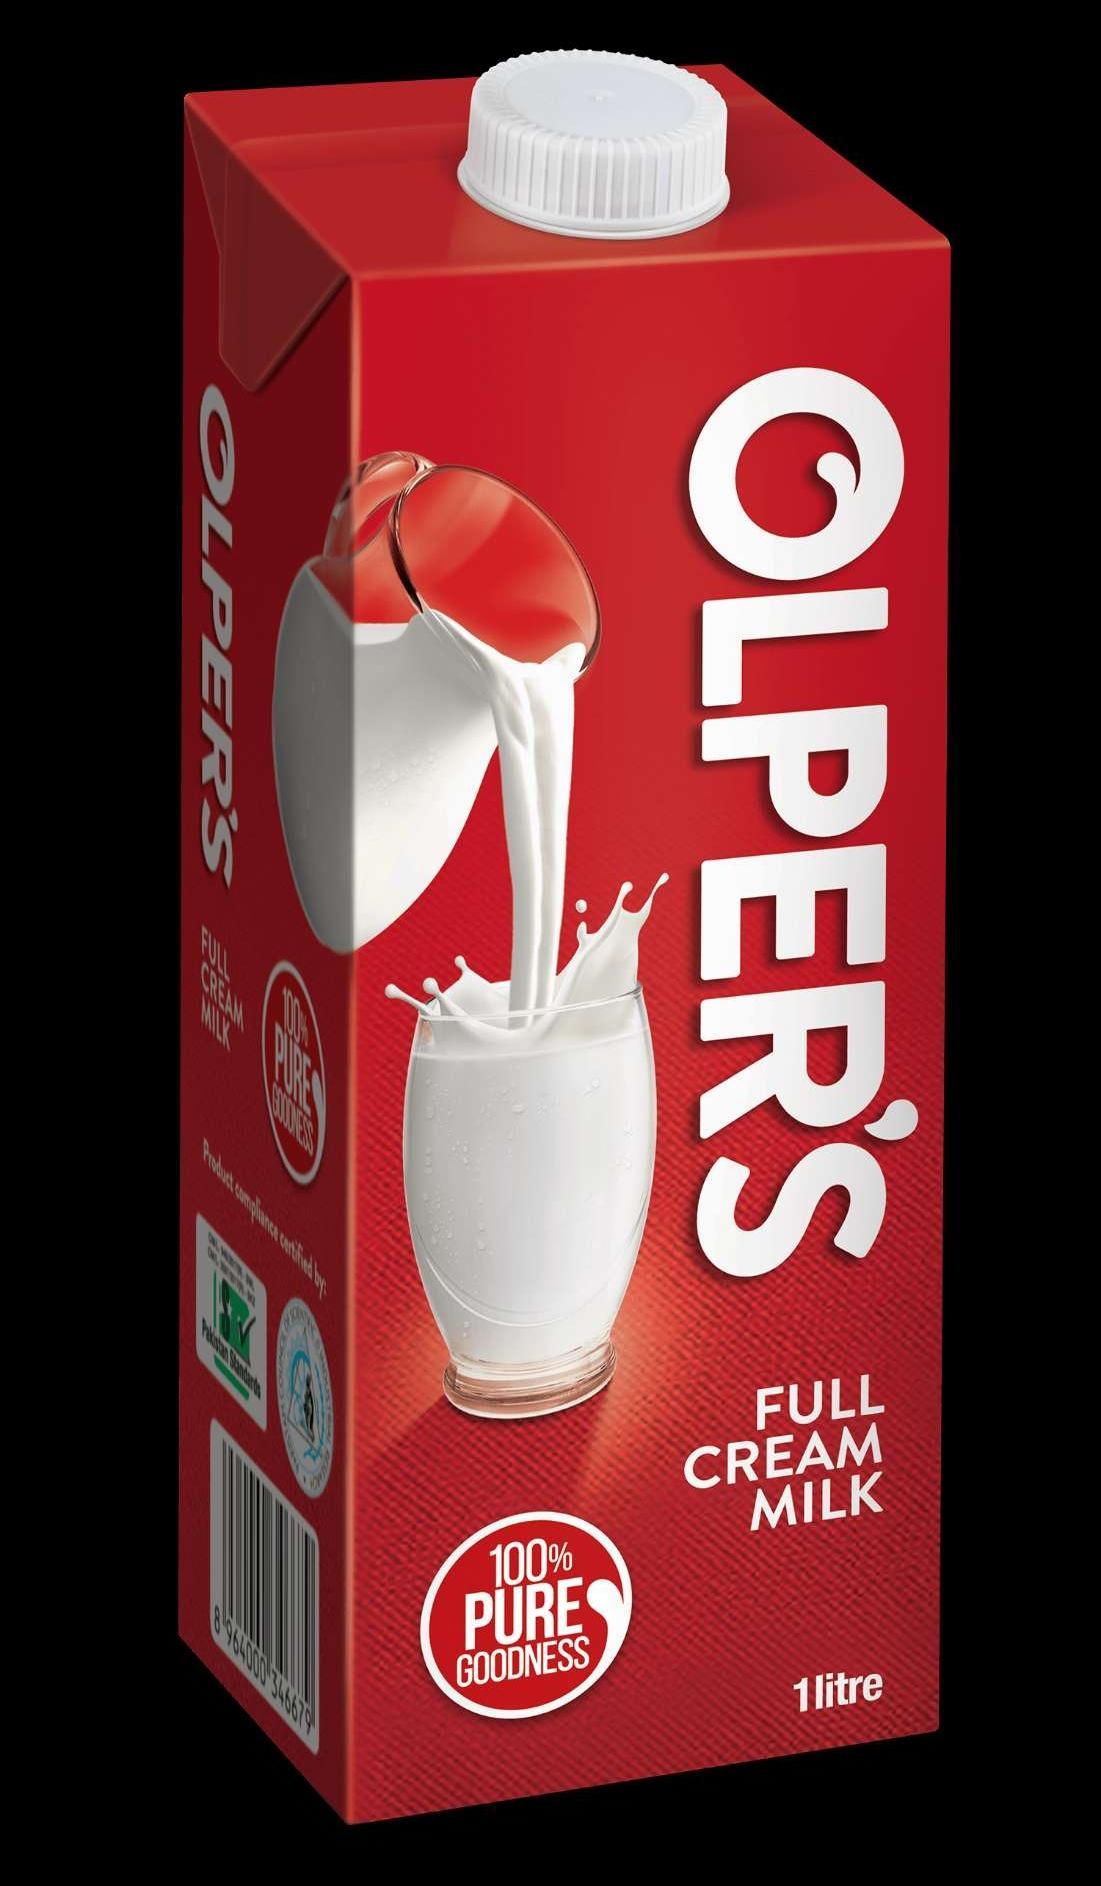 Uht Milk Powder Buy At Best Price Pediasure Complete Vanilla Tin 400 Gr Olper 1 Liter